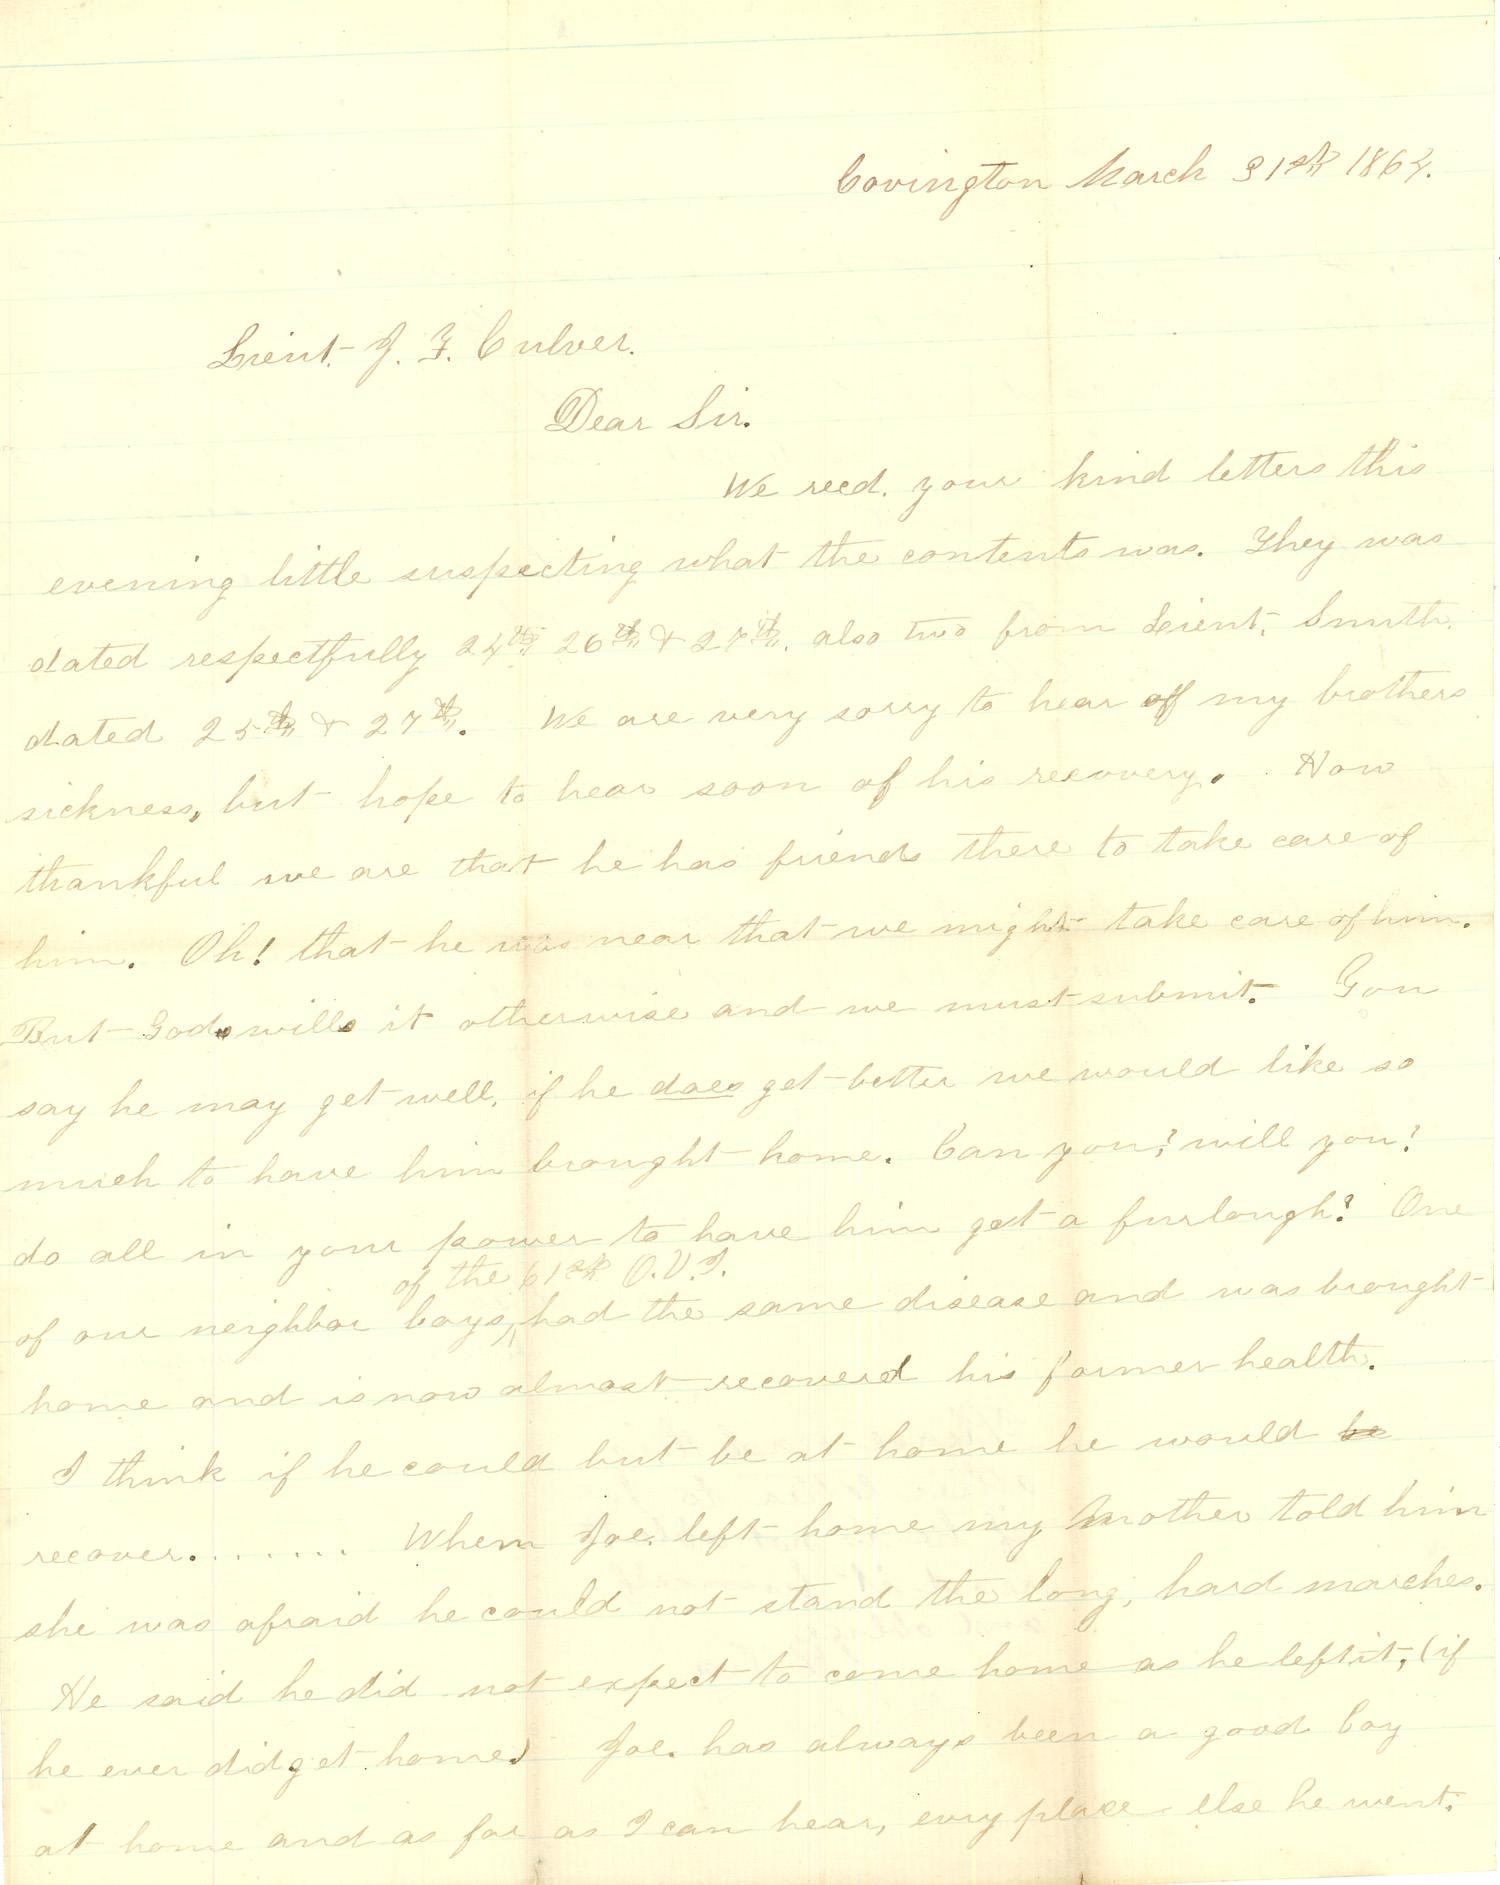 Joseph Culver Letter, March 31, 1864, Page 1